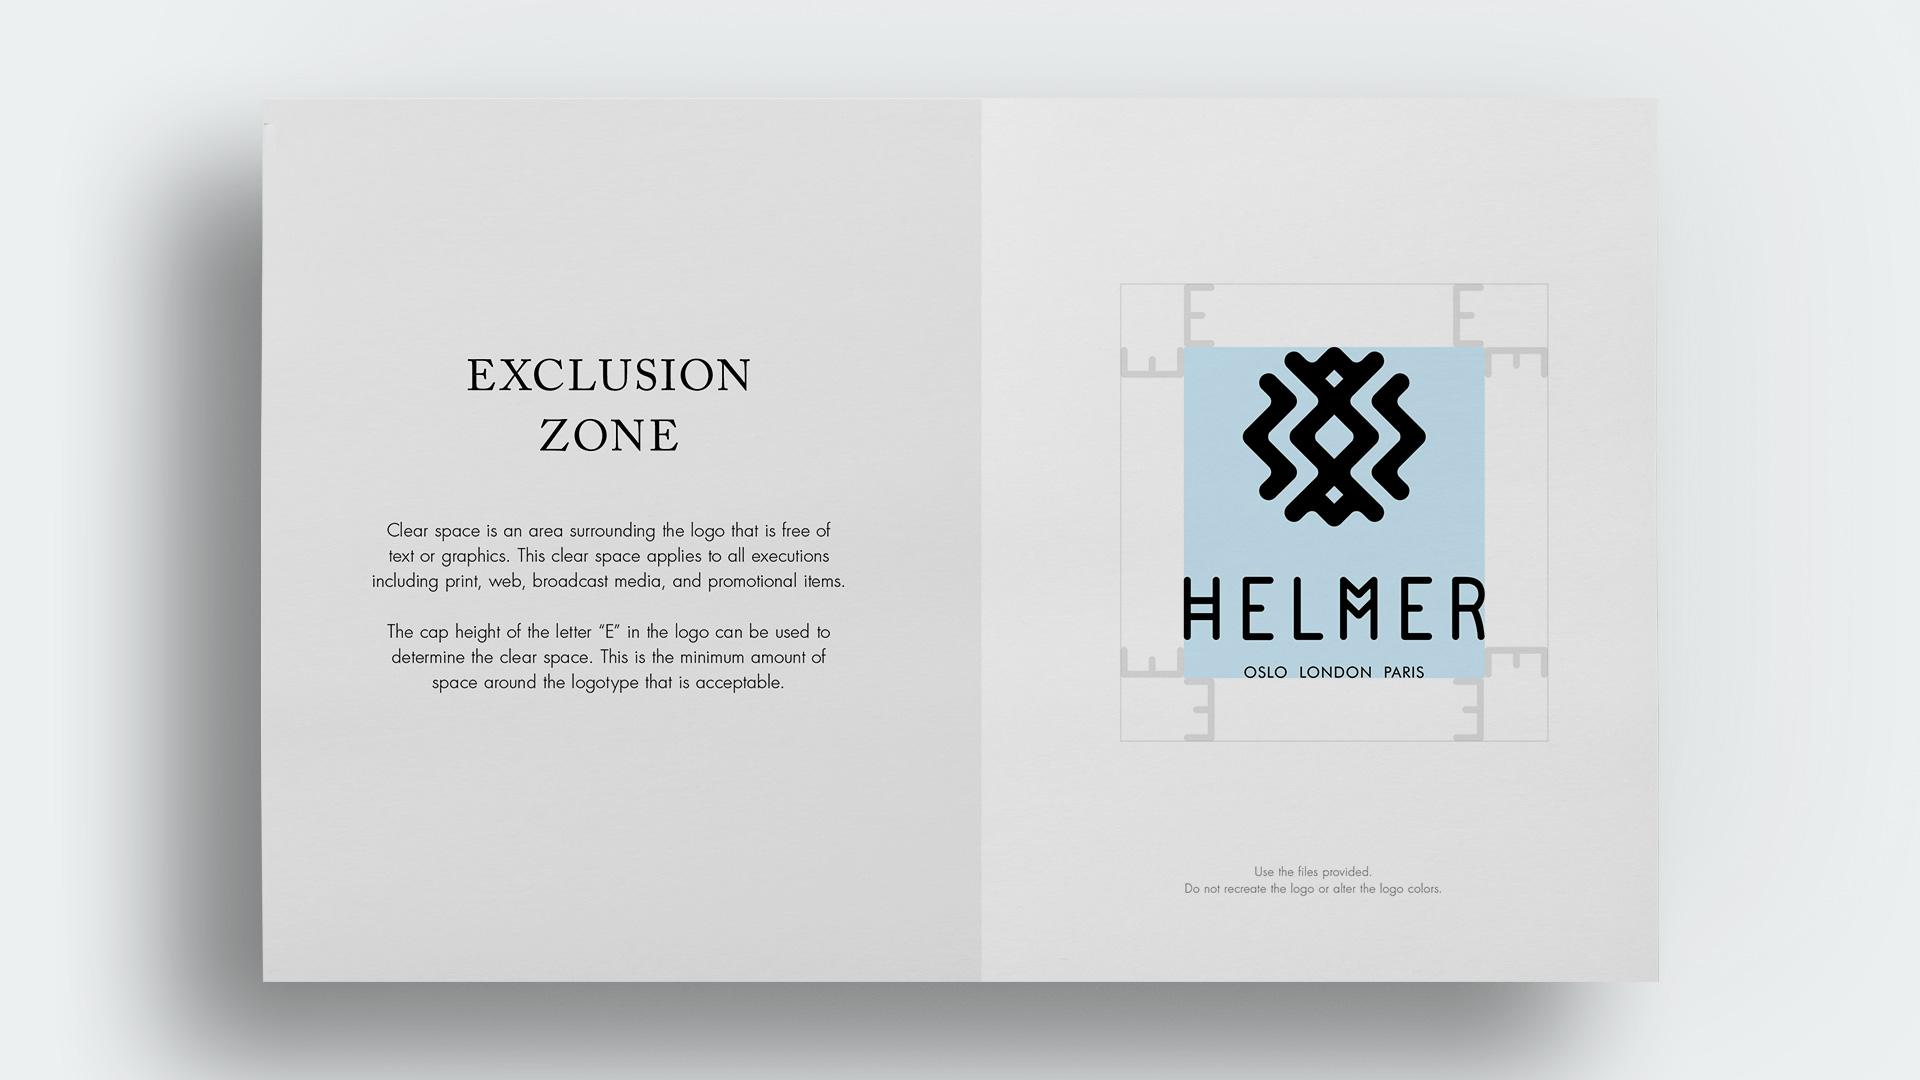 helmer_BB_01